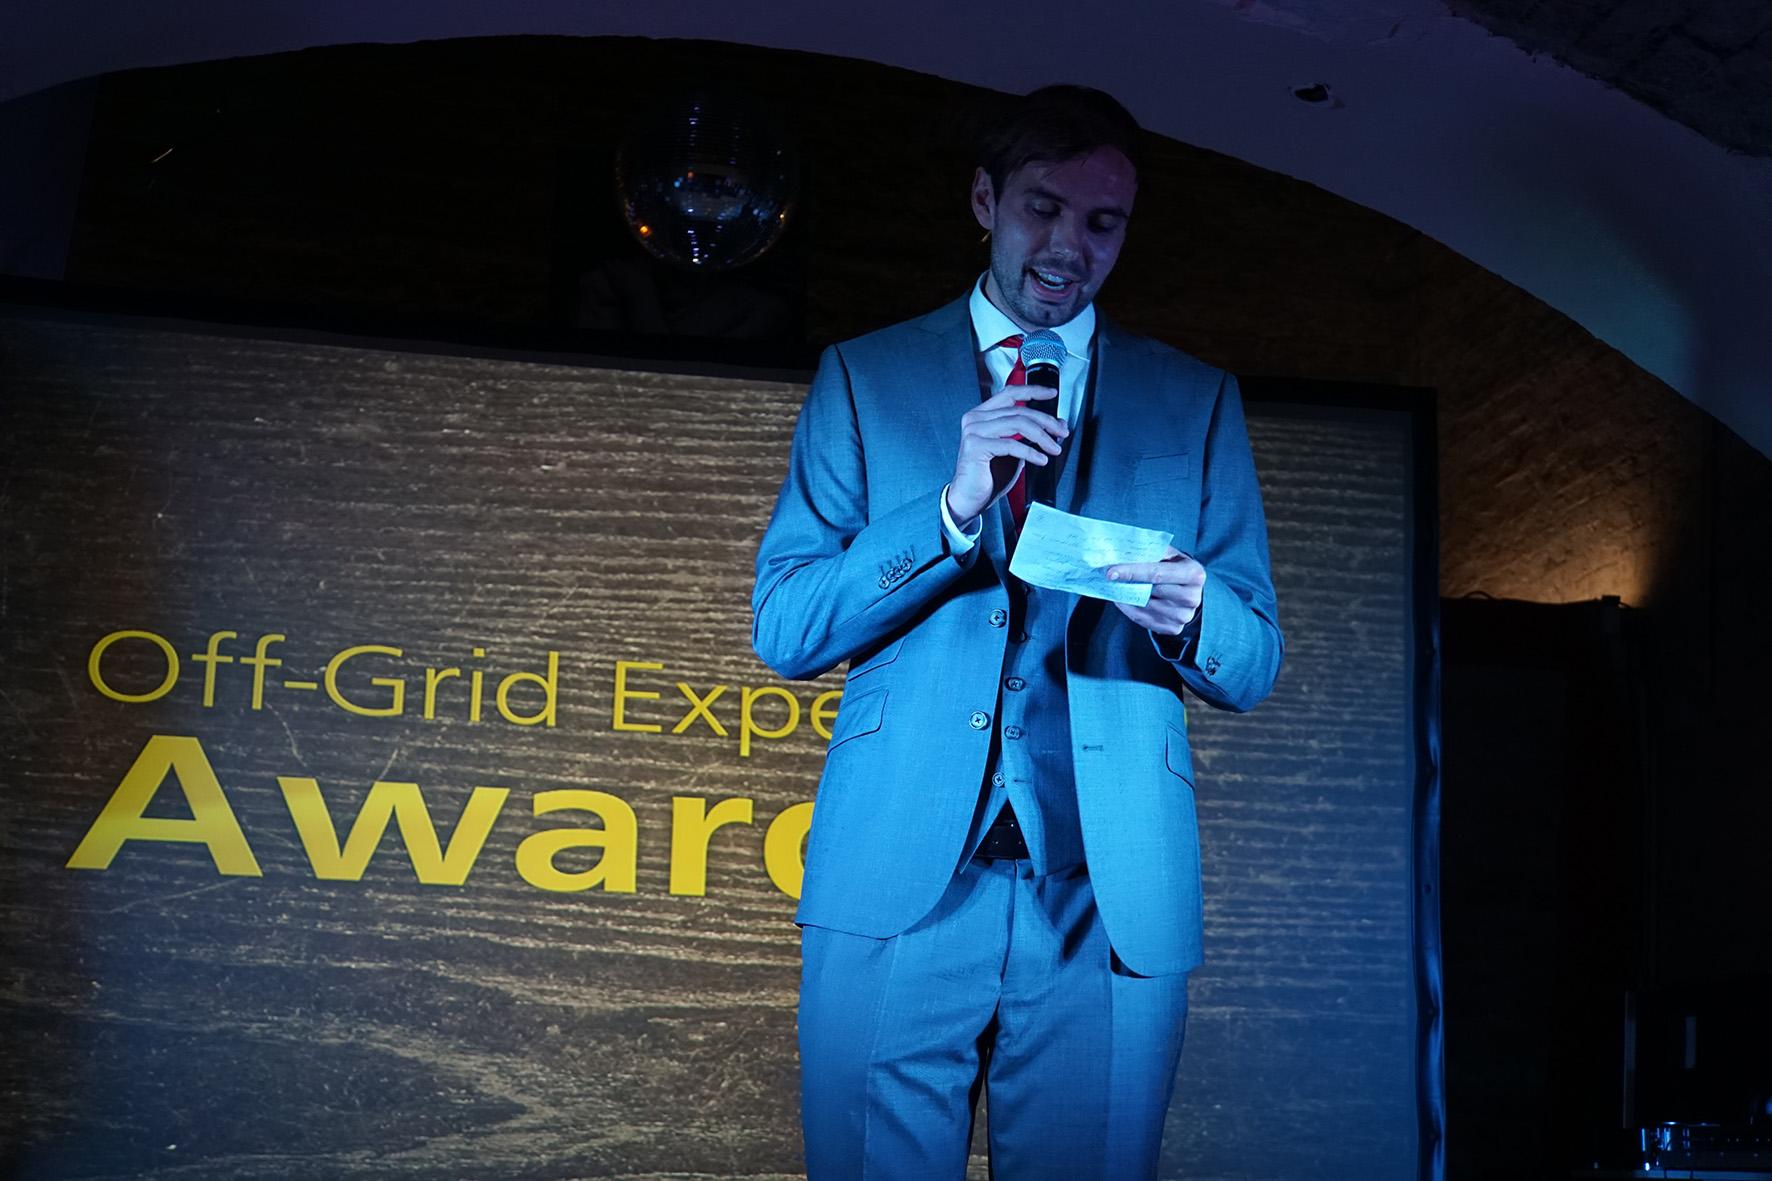 Off-Grid Awards 2015